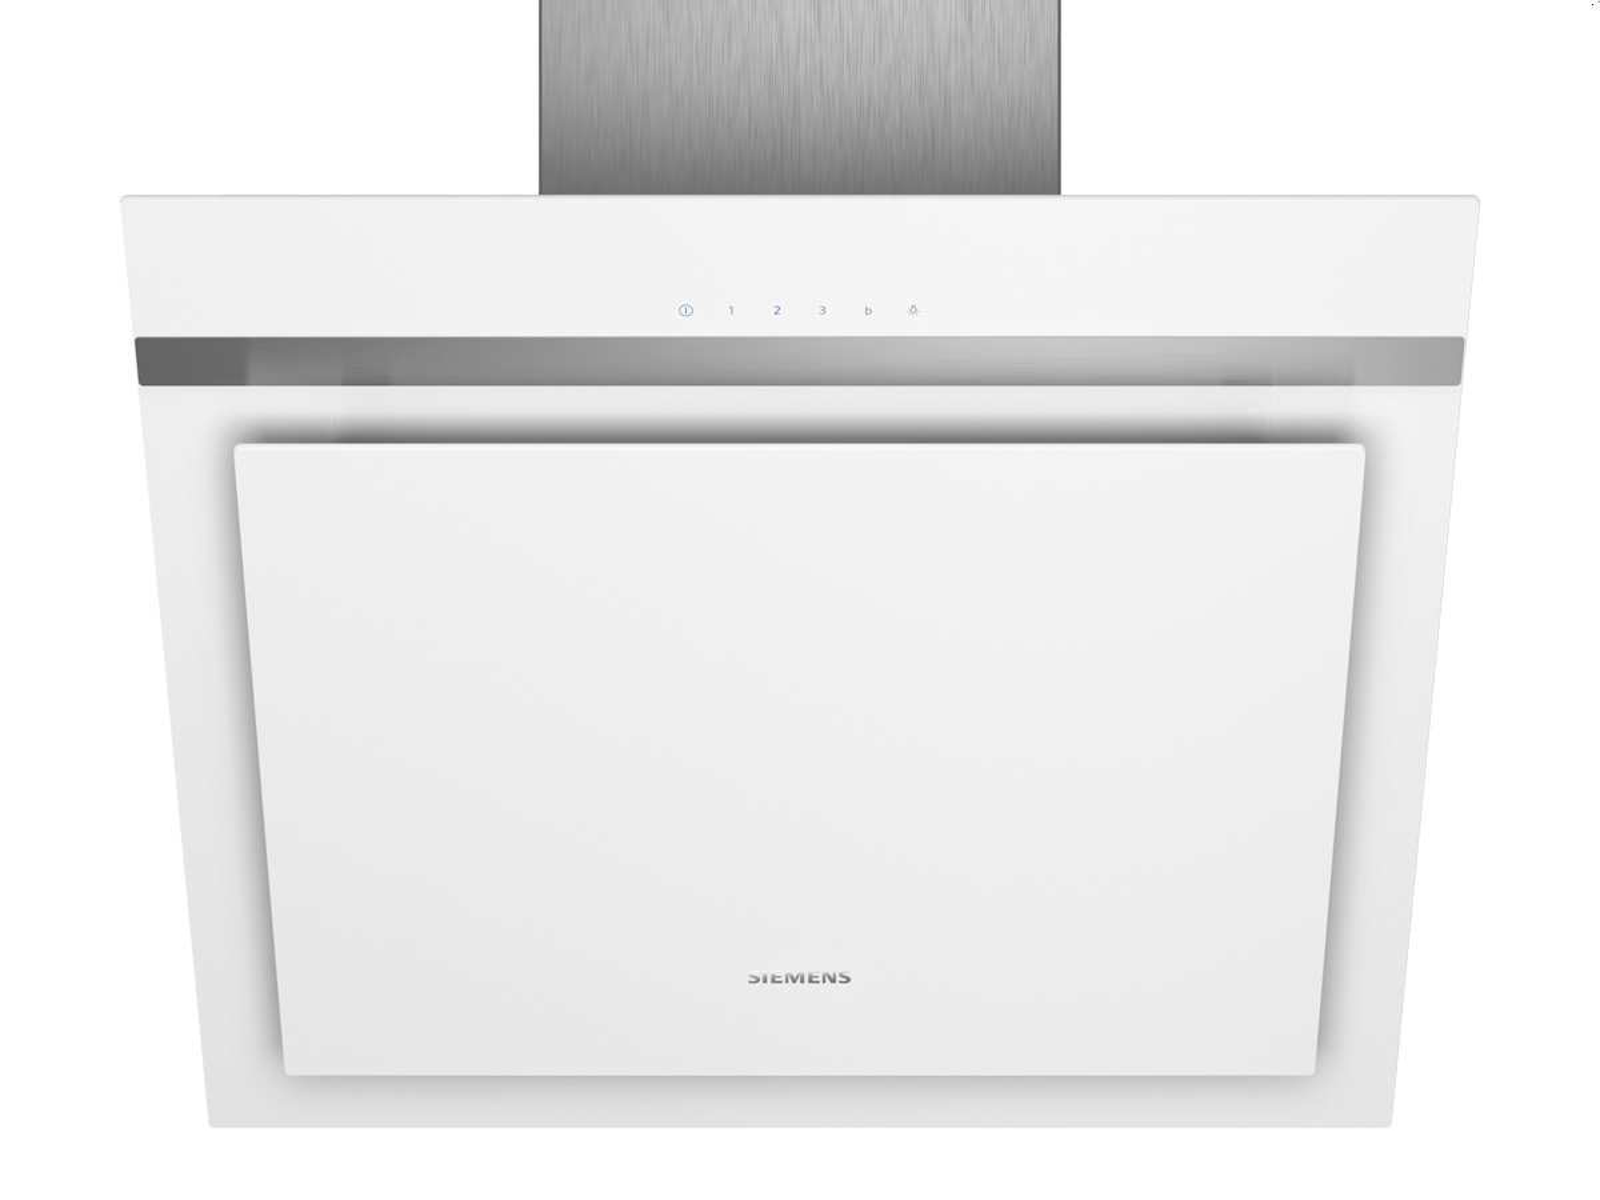 Siemens lc67khm20 kopffreihaube weiß